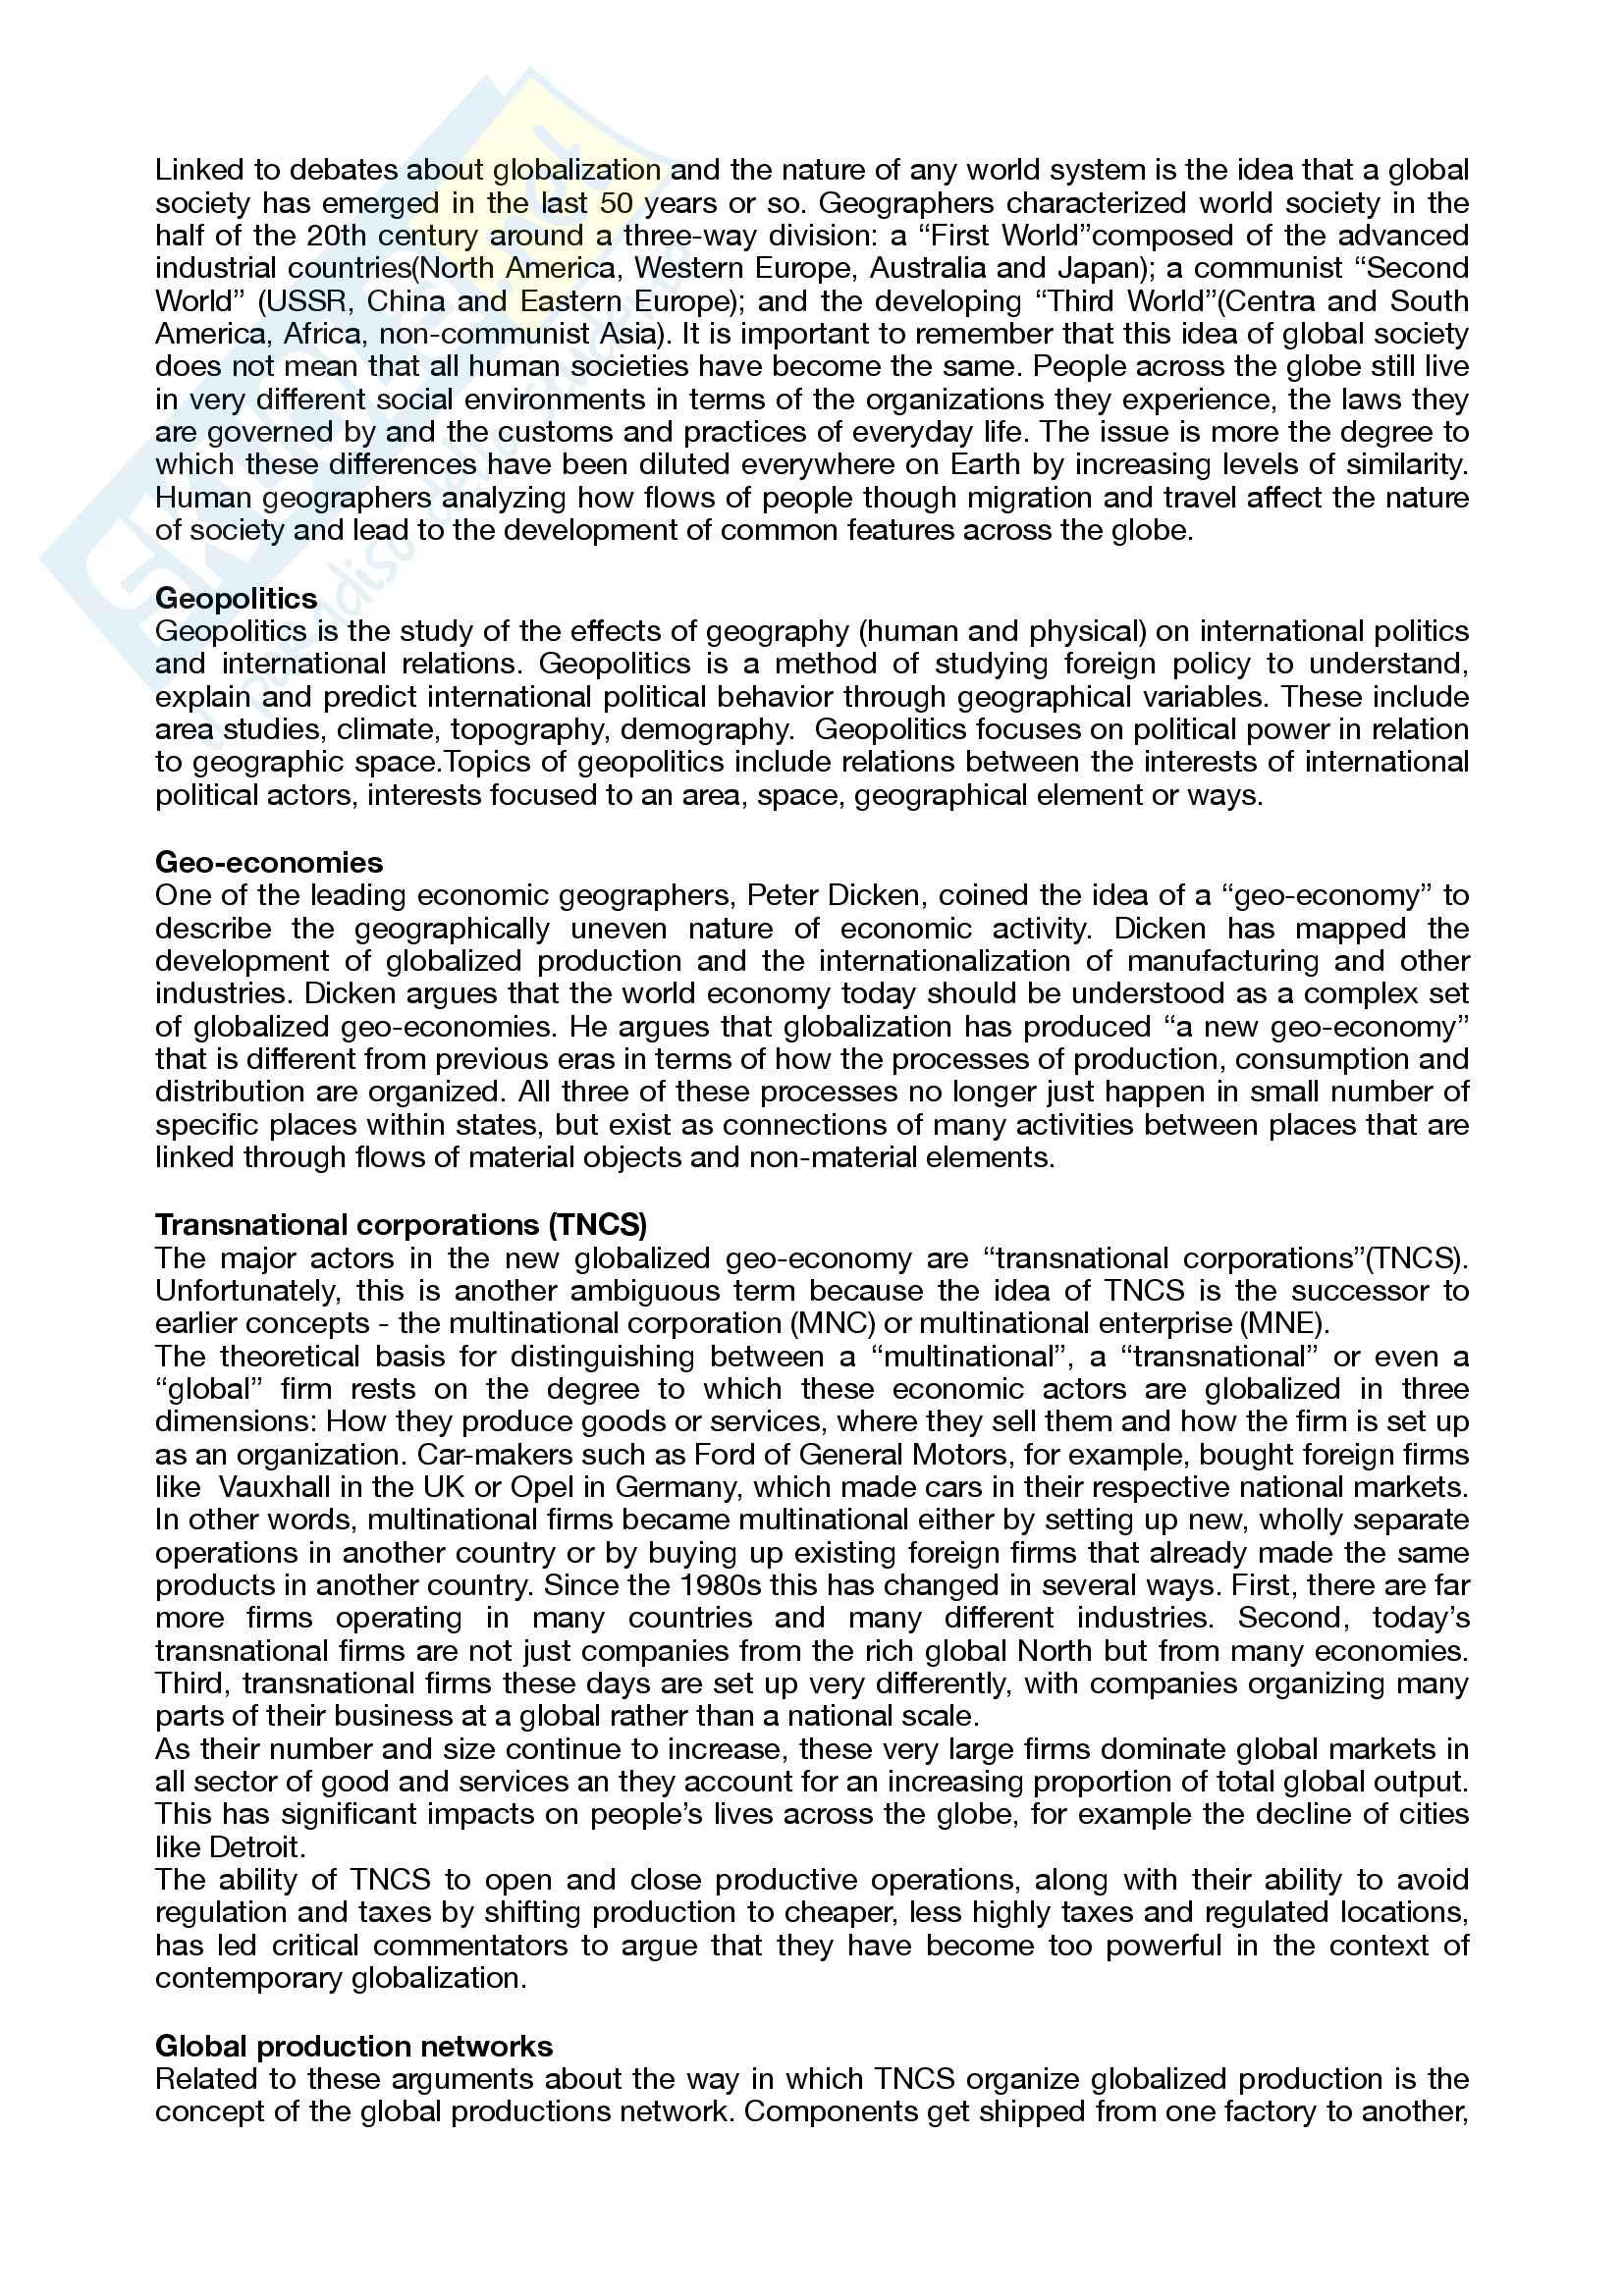 Riassunto esame geography / geografia, docente Zignale, libro consigliato Human geography: the basics, Andrew Jones Pag. 2